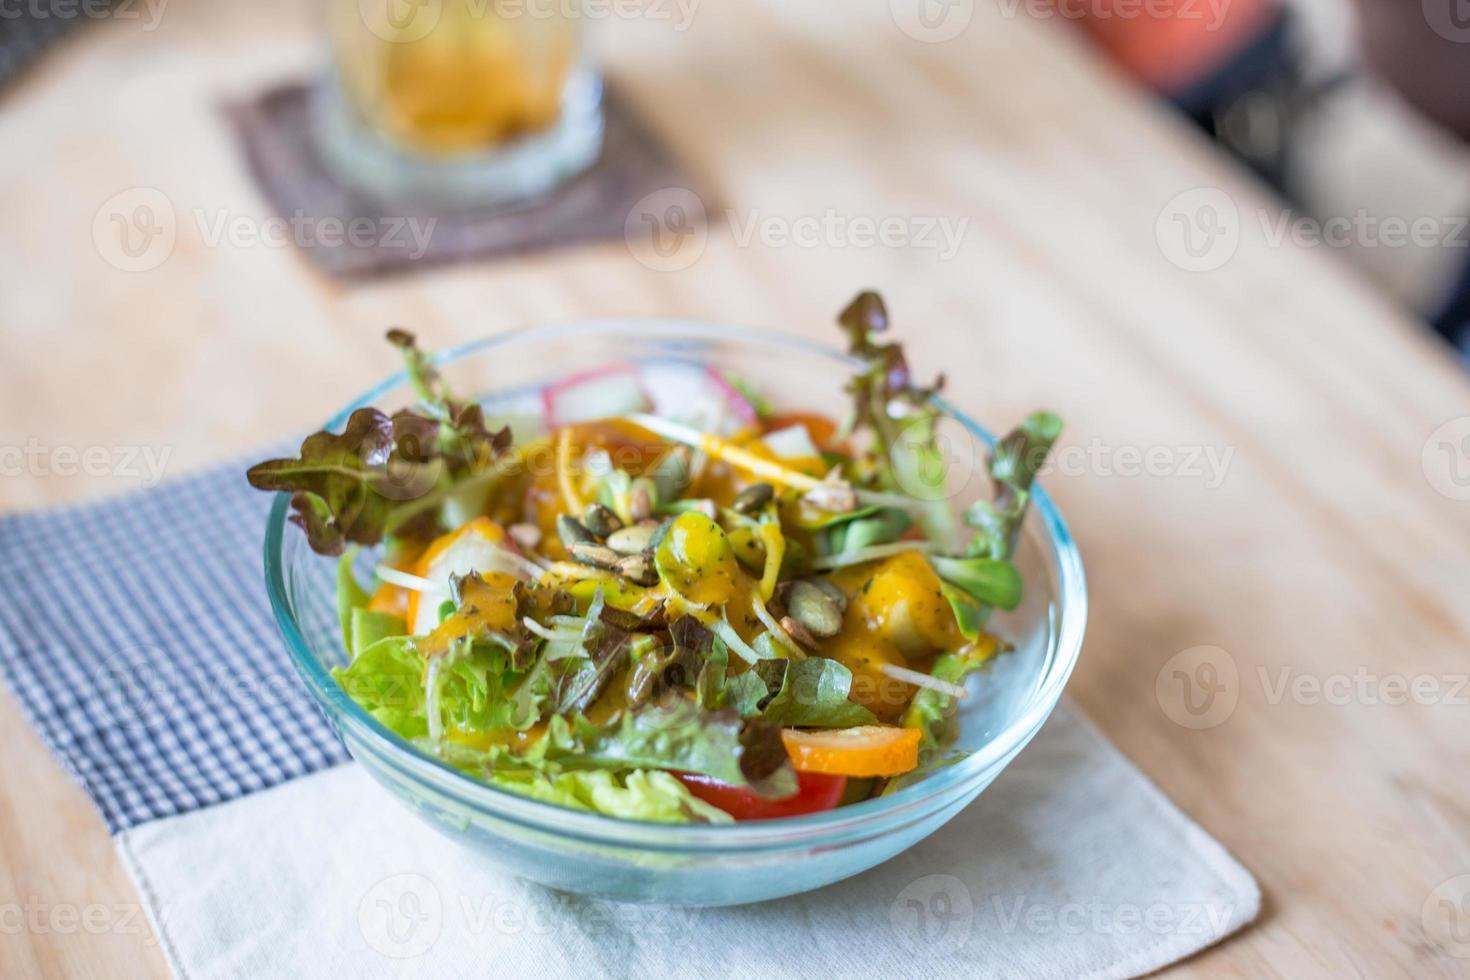 schone gezonde fruitsalade foto